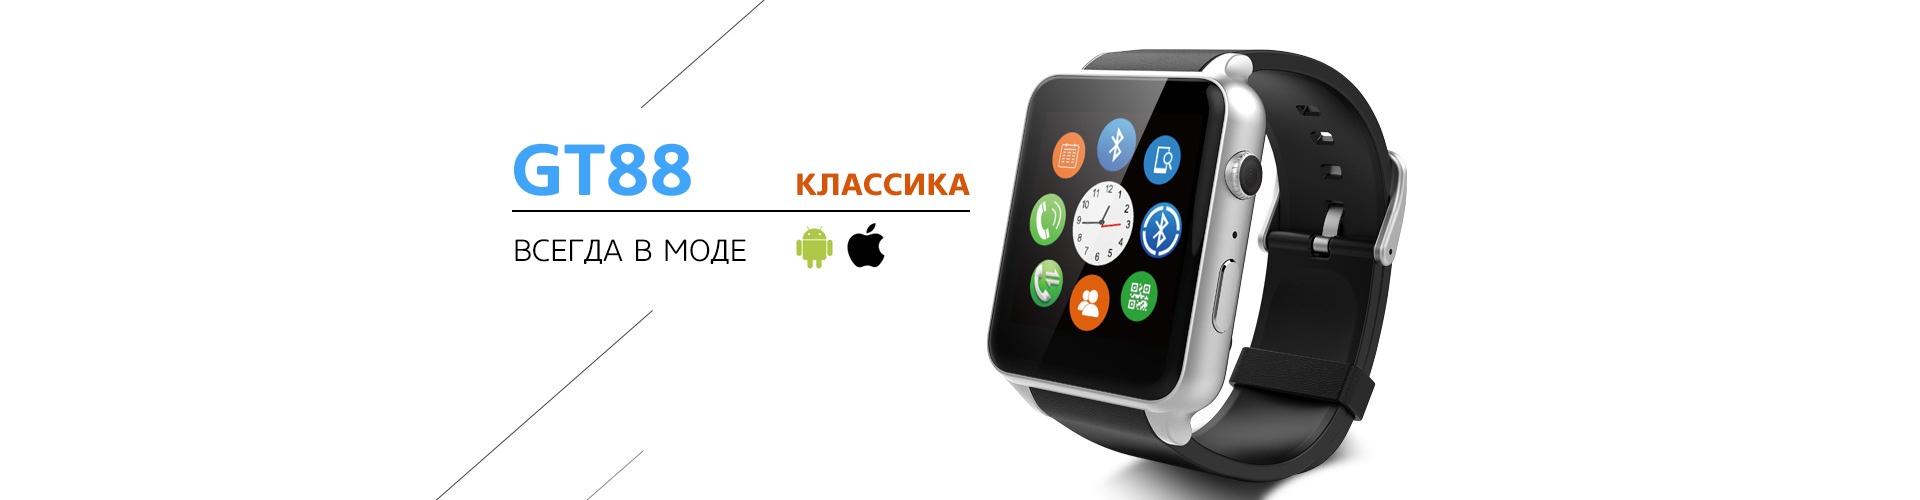 Купить gt88 kingwear в Украине